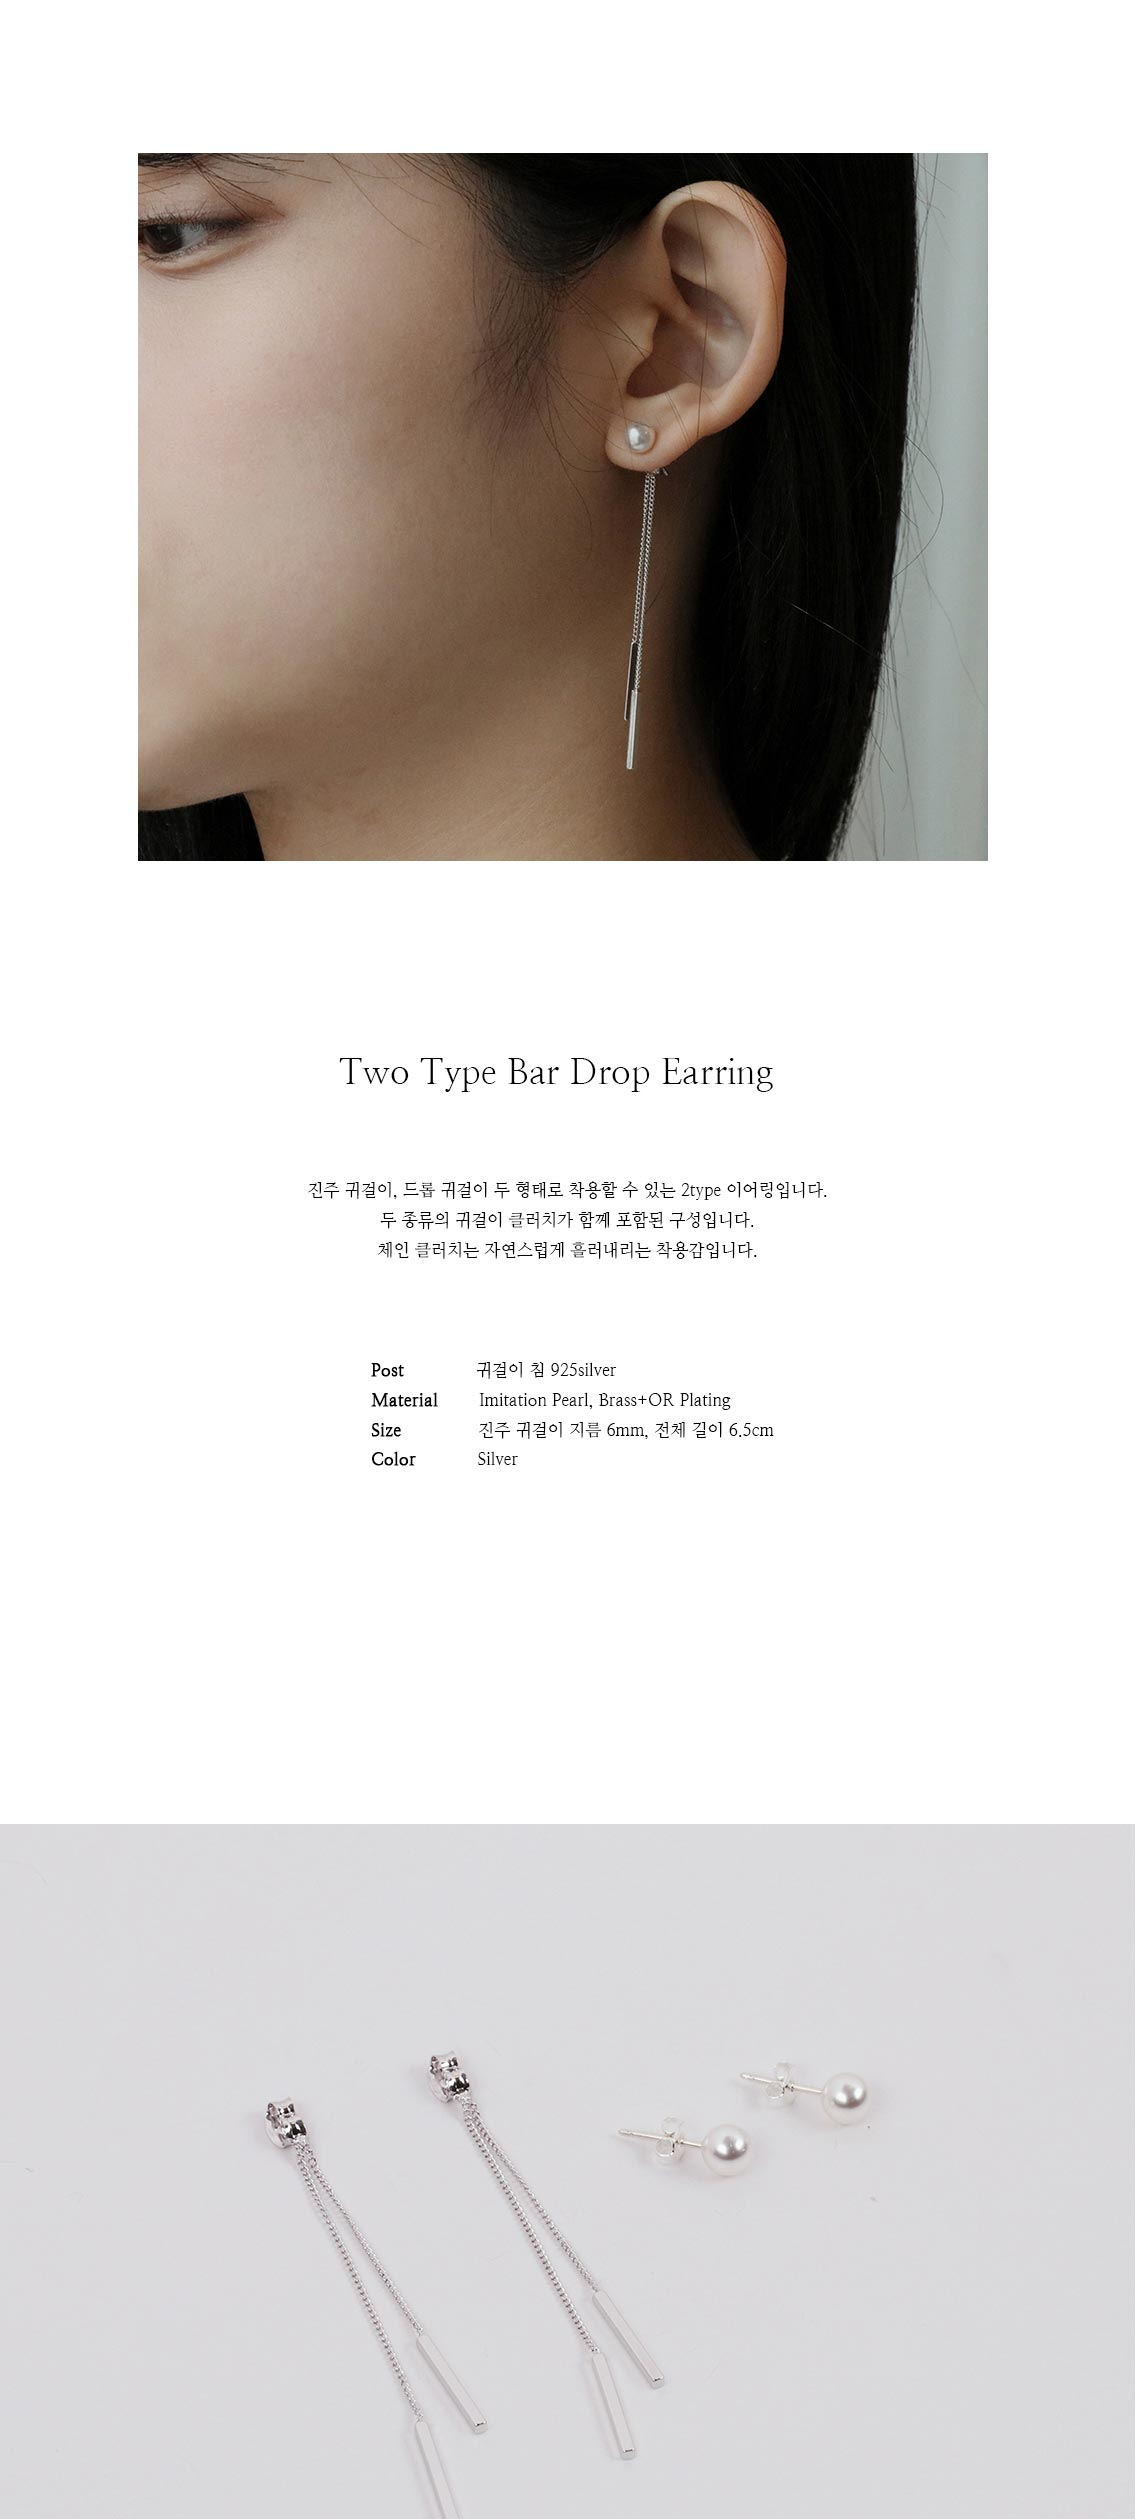 two type bar drop earring15,400원-레스이즈모어패션잡화, 주얼리, 귀걸이, 패션바보사랑two type bar drop earring15,400원-레스이즈모어패션잡화, 주얼리, 귀걸이, 패션바보사랑